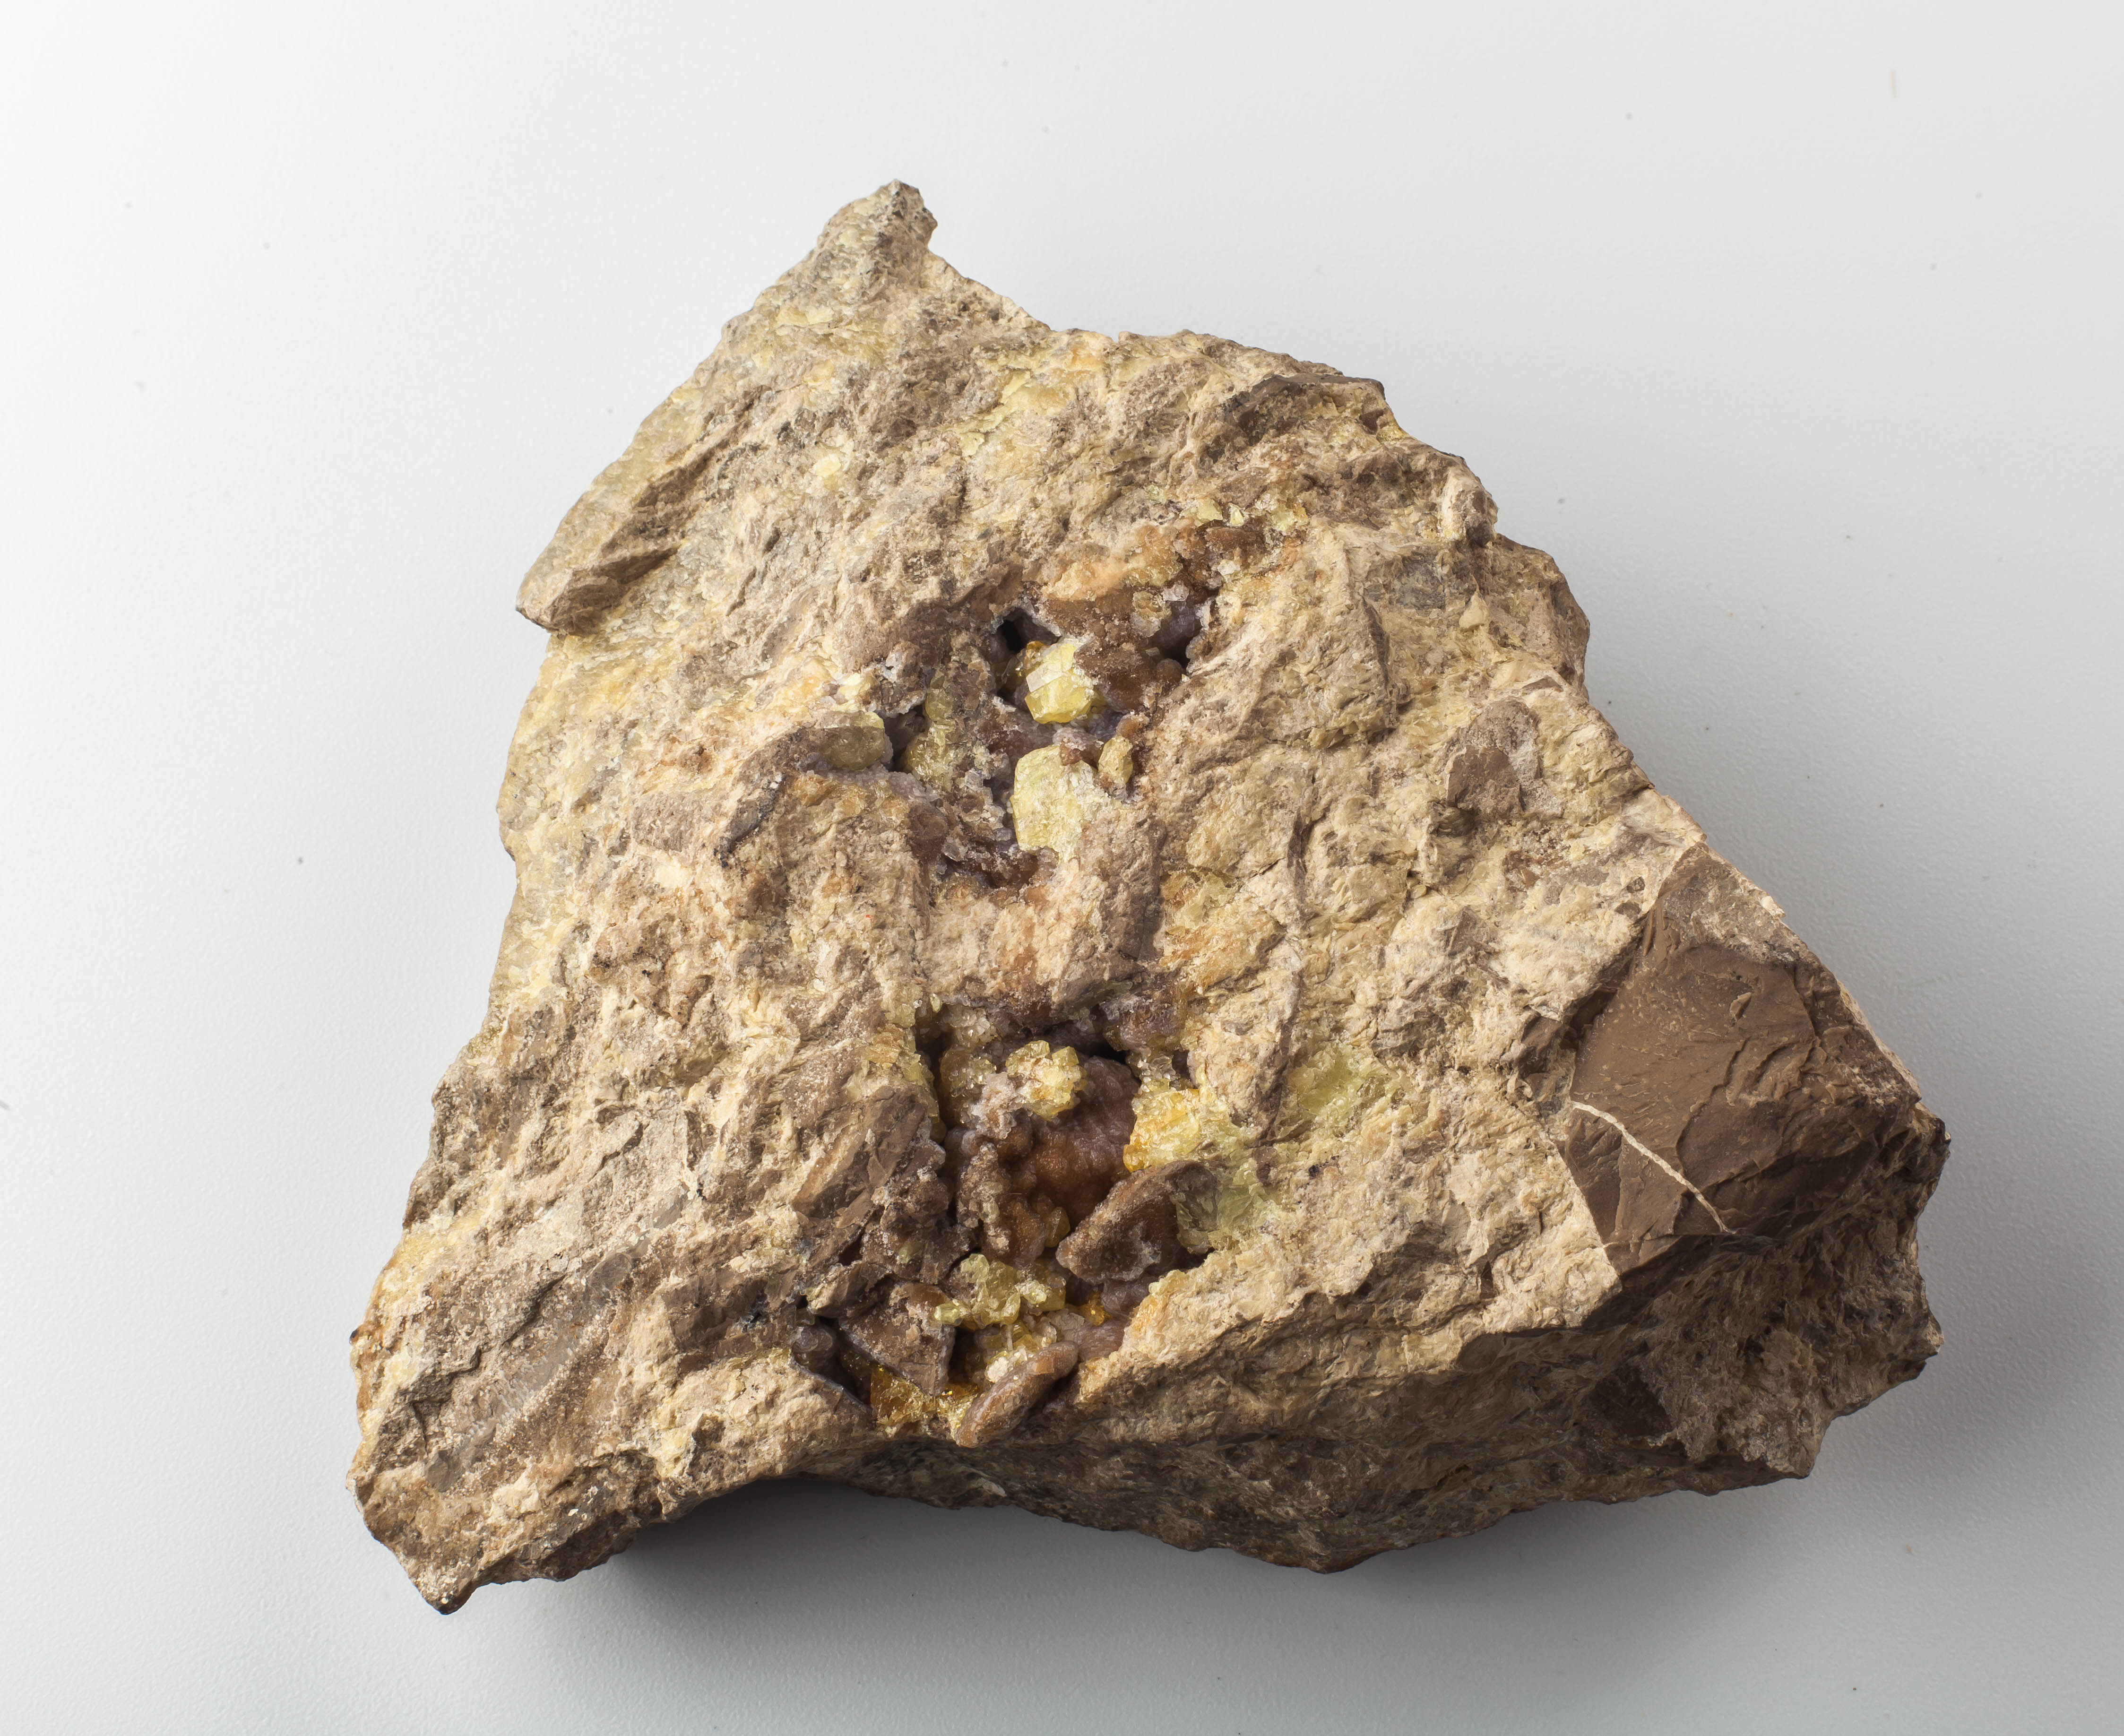 IES_SANISIDRO_MUSEO_Geologia_010